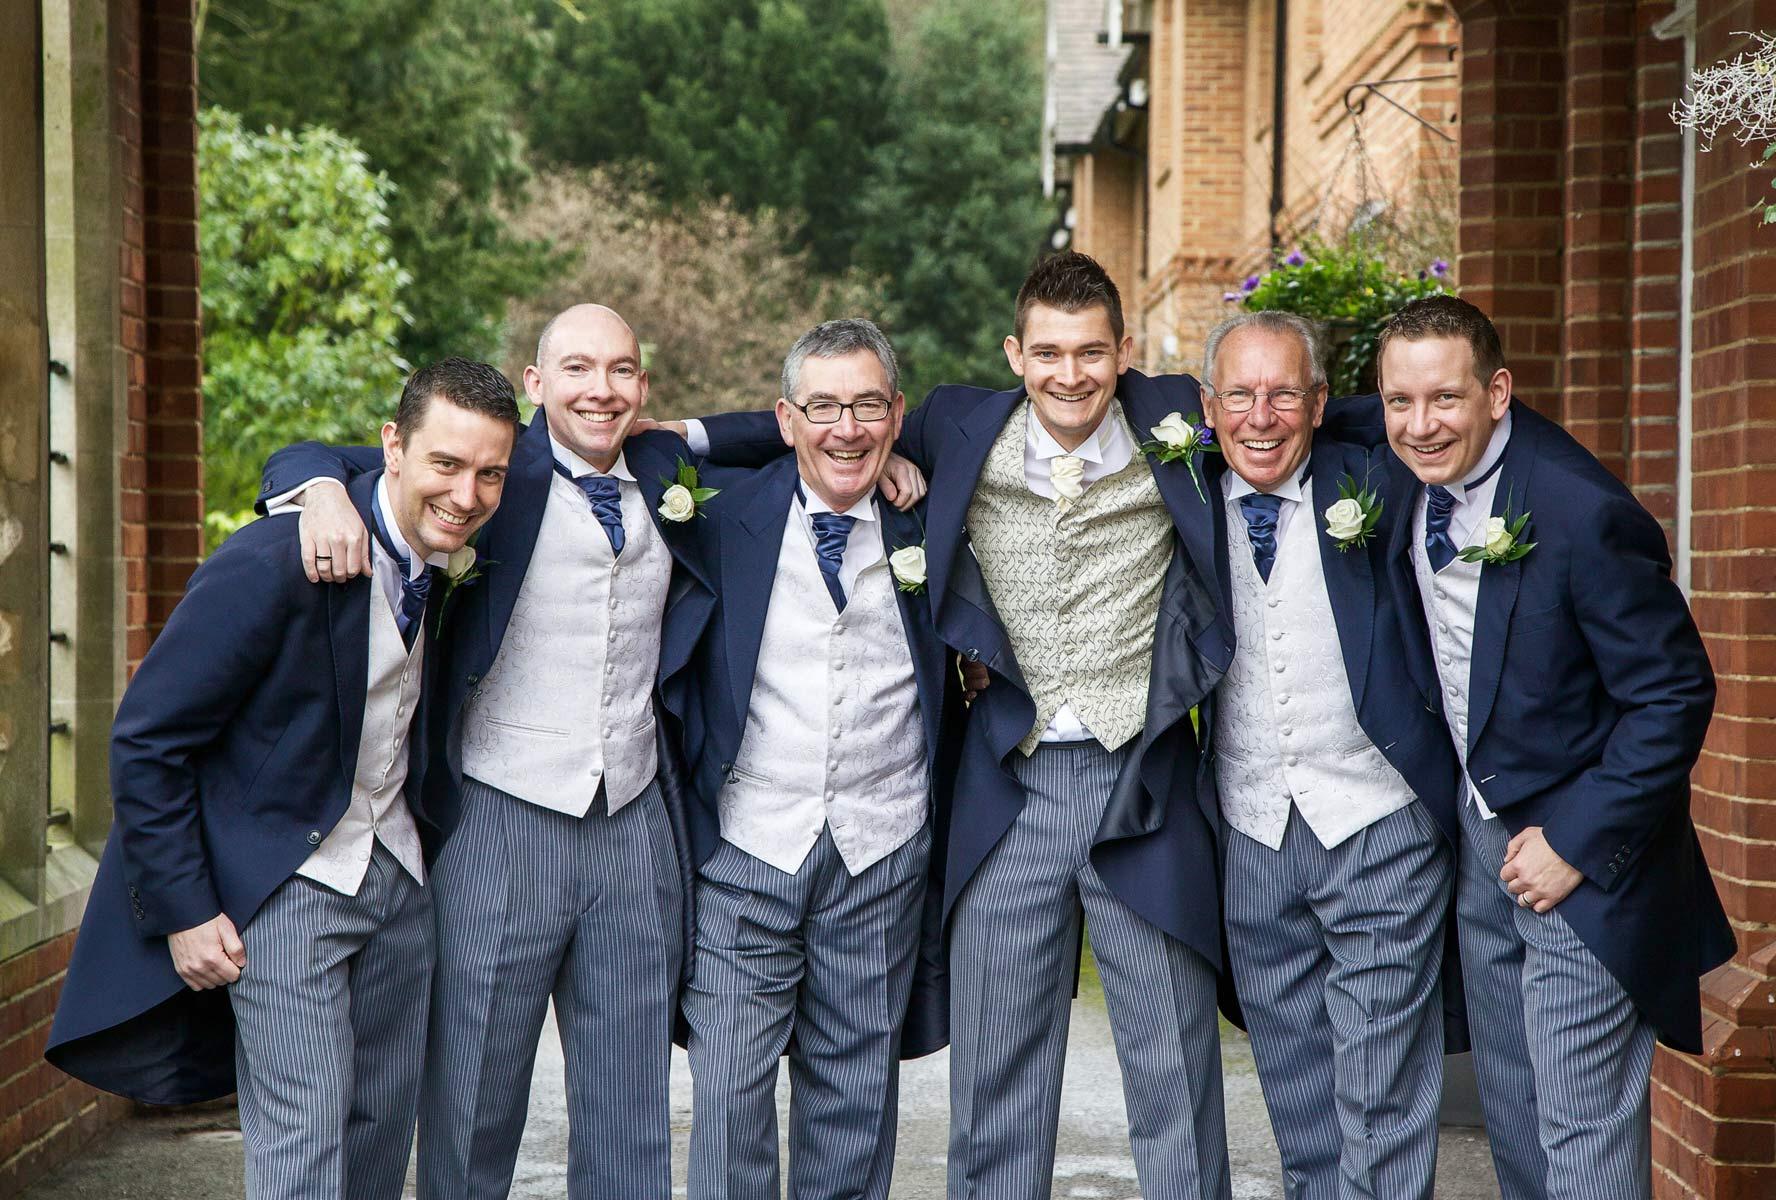 Audleys_Wood_Wedding_Photographer_Basingstoke_008.jpg